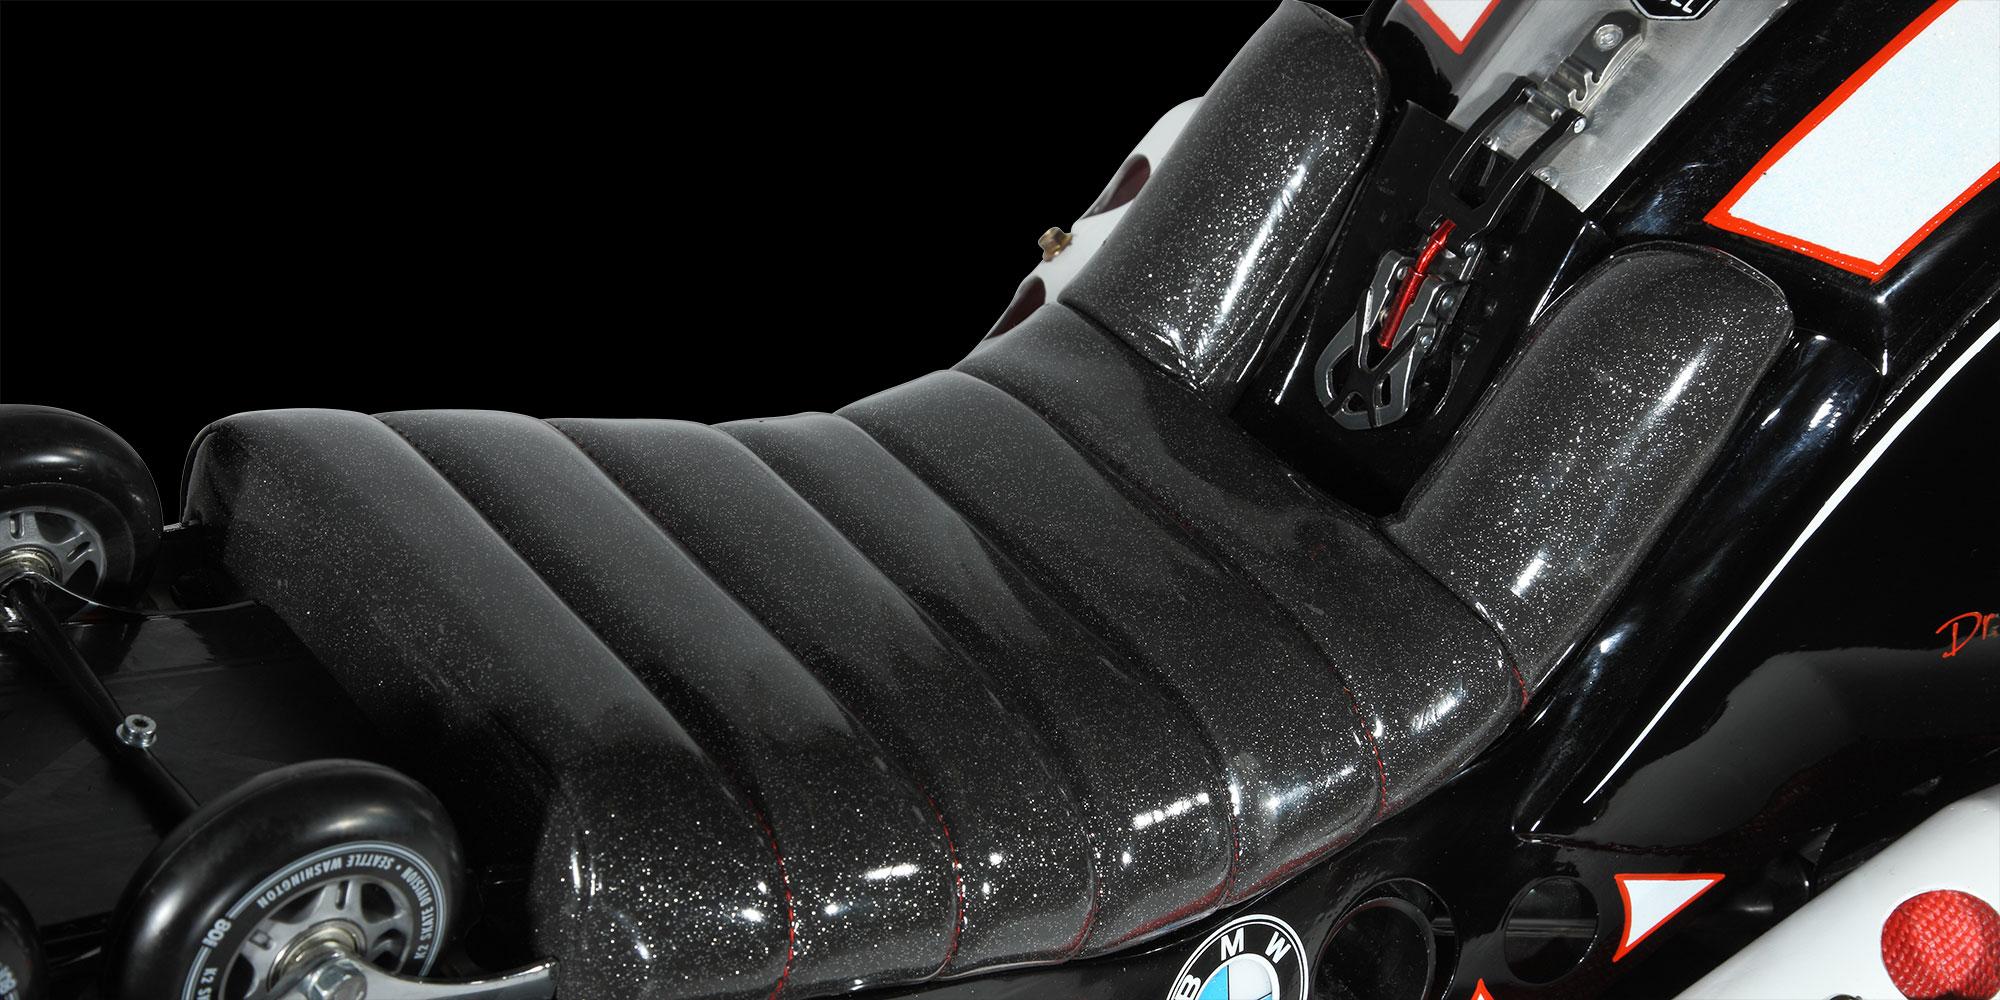 BMW R9T Scrambler Husky